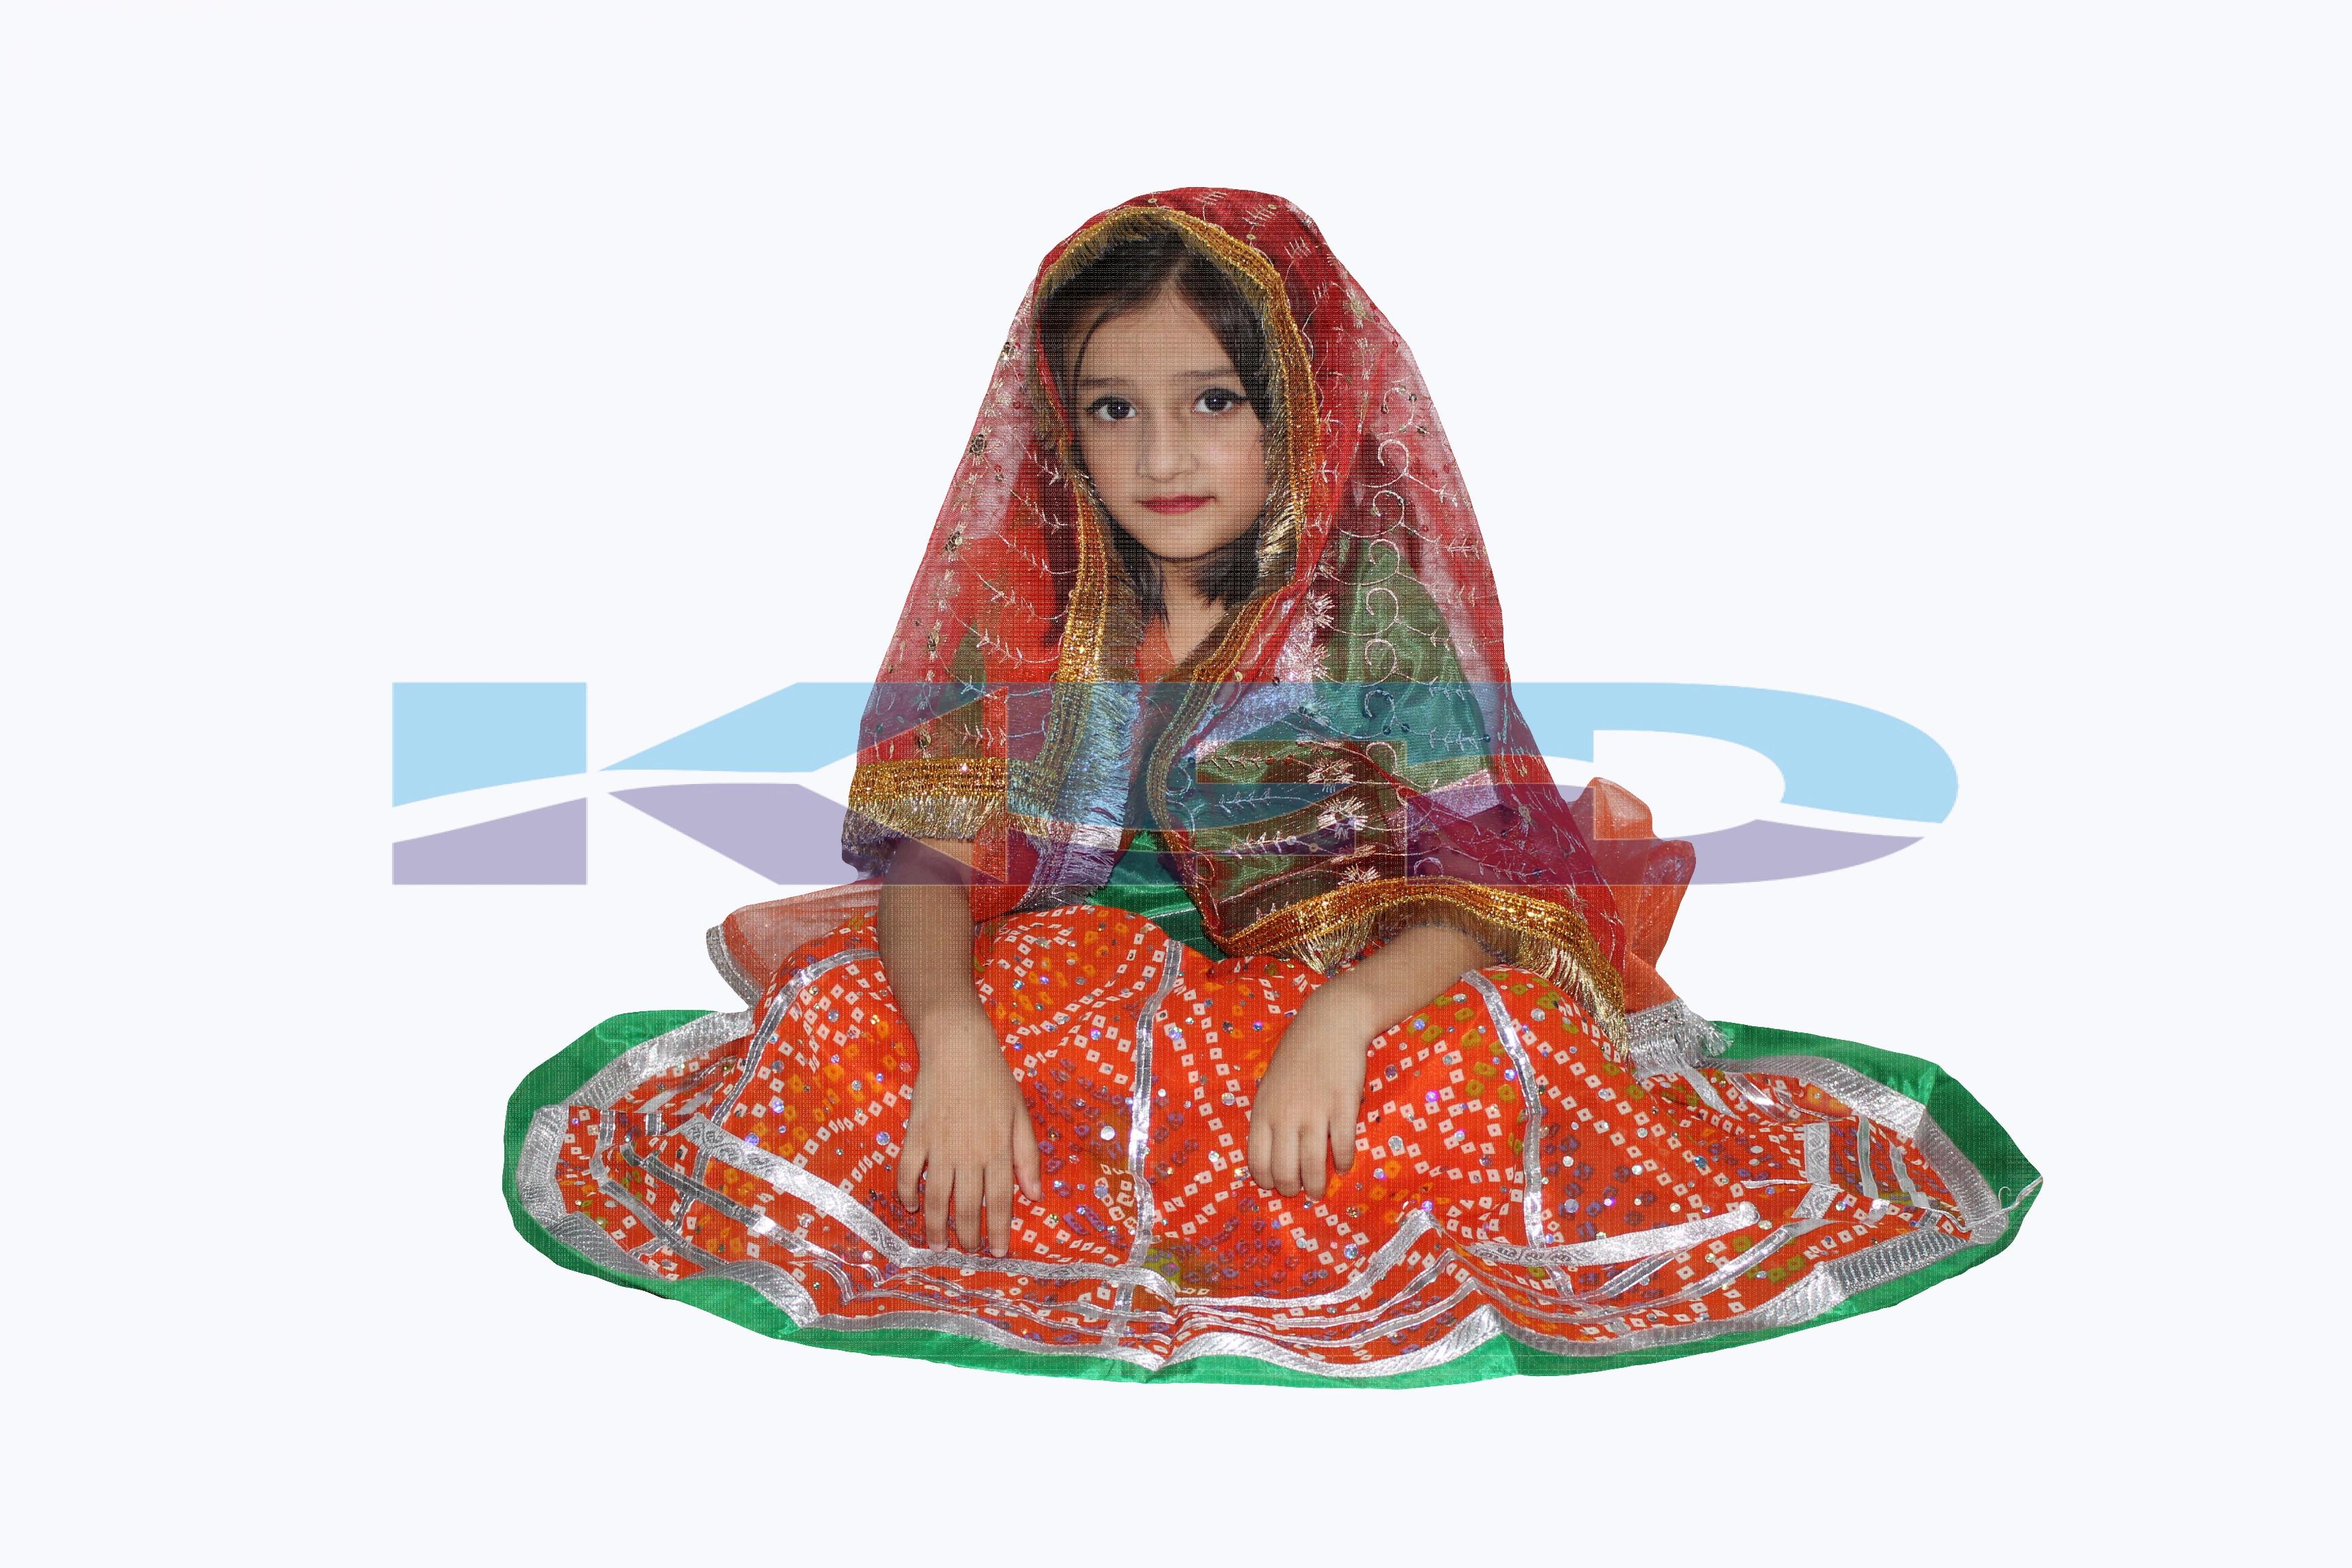 Mata Ki Chunari/Navratri Chunni For Kanya Pujan/Devi Mata Full Jari Chunari/Durga Devi Chunni With Golden Embroidery And Lace,Used For Various Hindu Puja